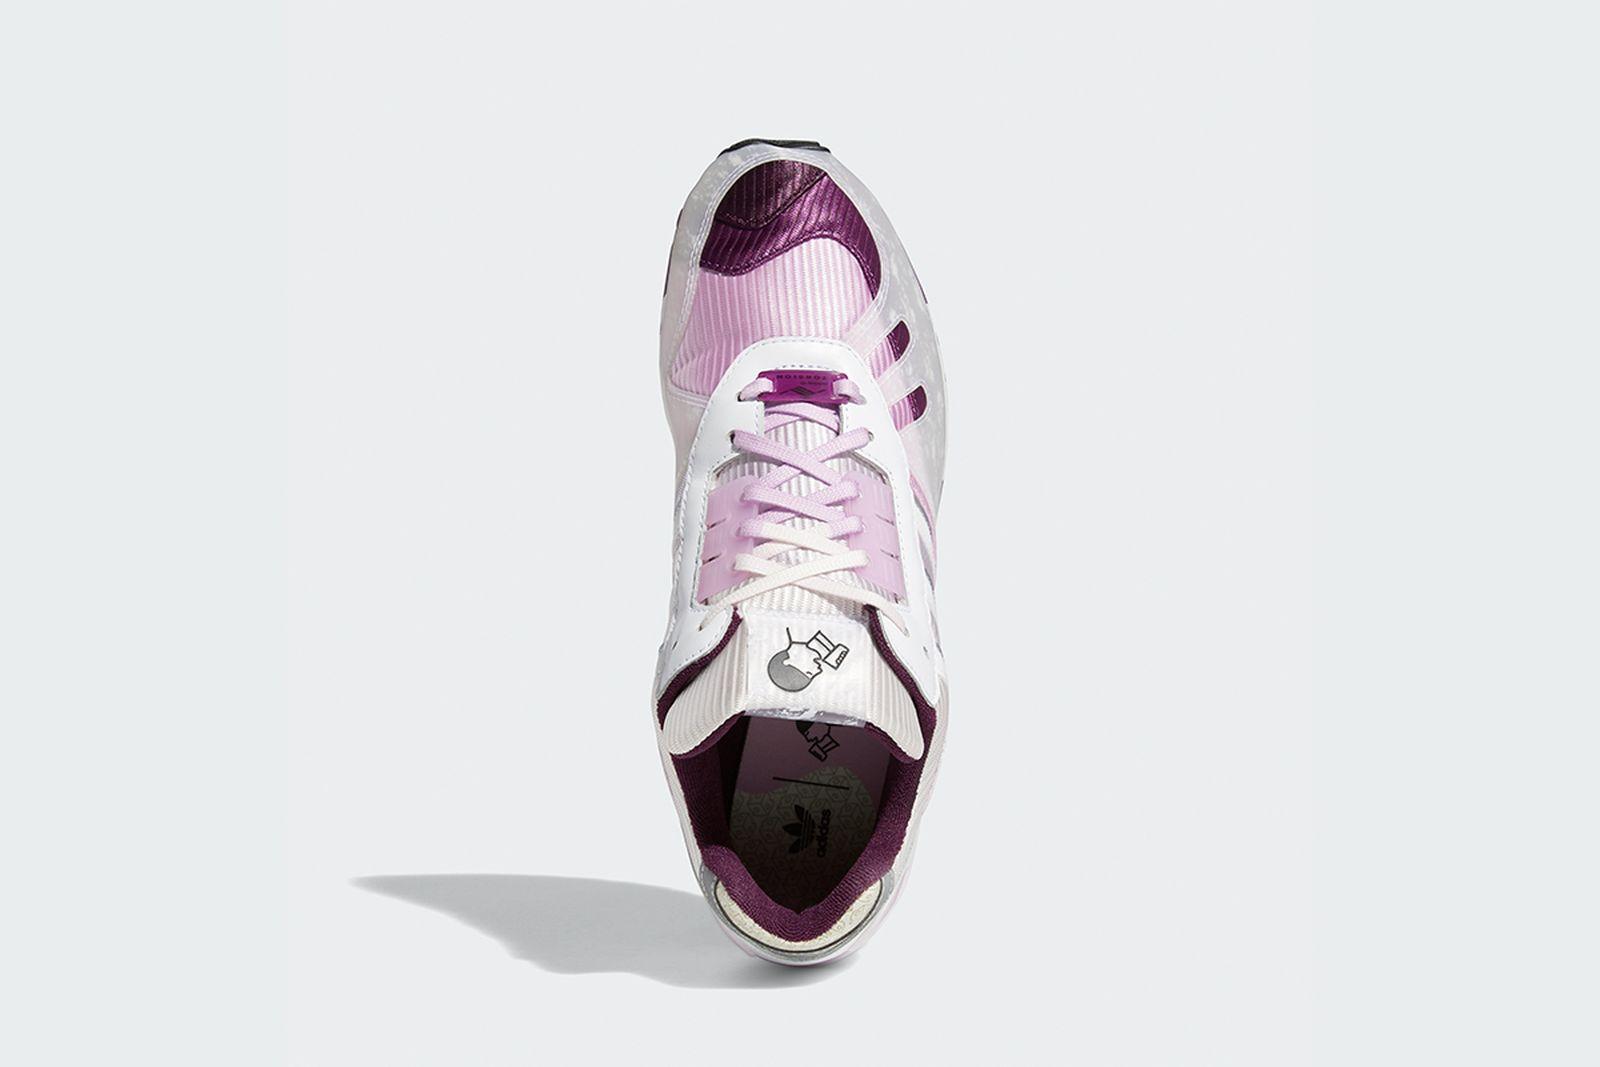 adidas-heytea-zx-7000-release-date-price-06